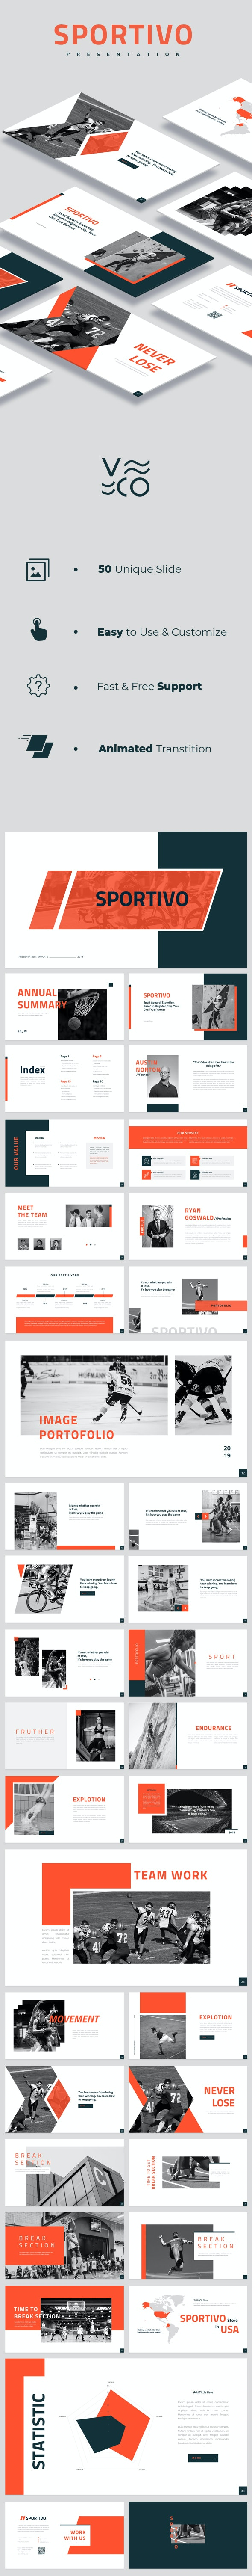 Sportivo Google Slides - Google Slides Presentation Templates